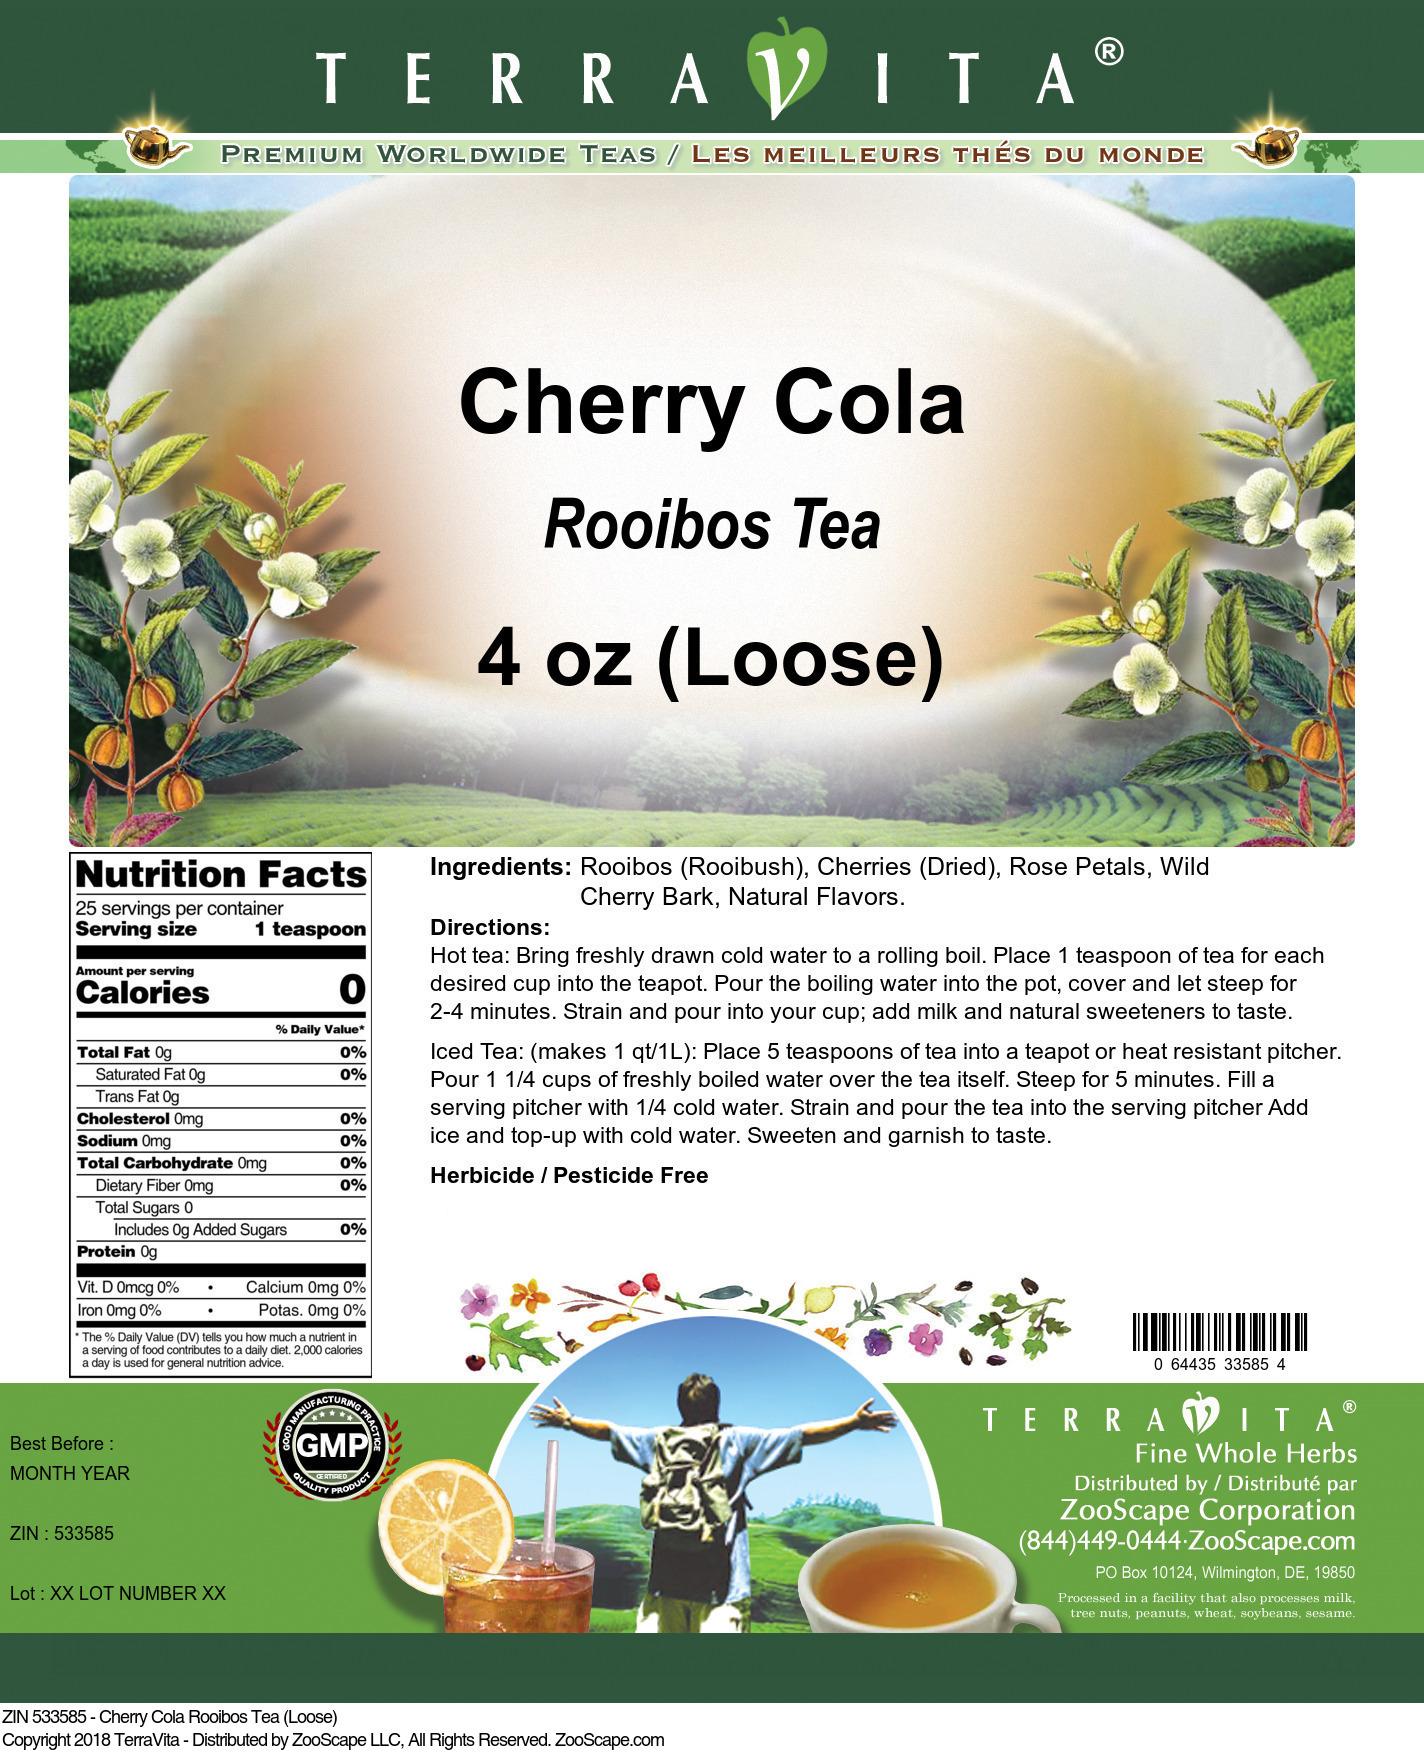 Cherry Cola Rooibos Tea (Loose)